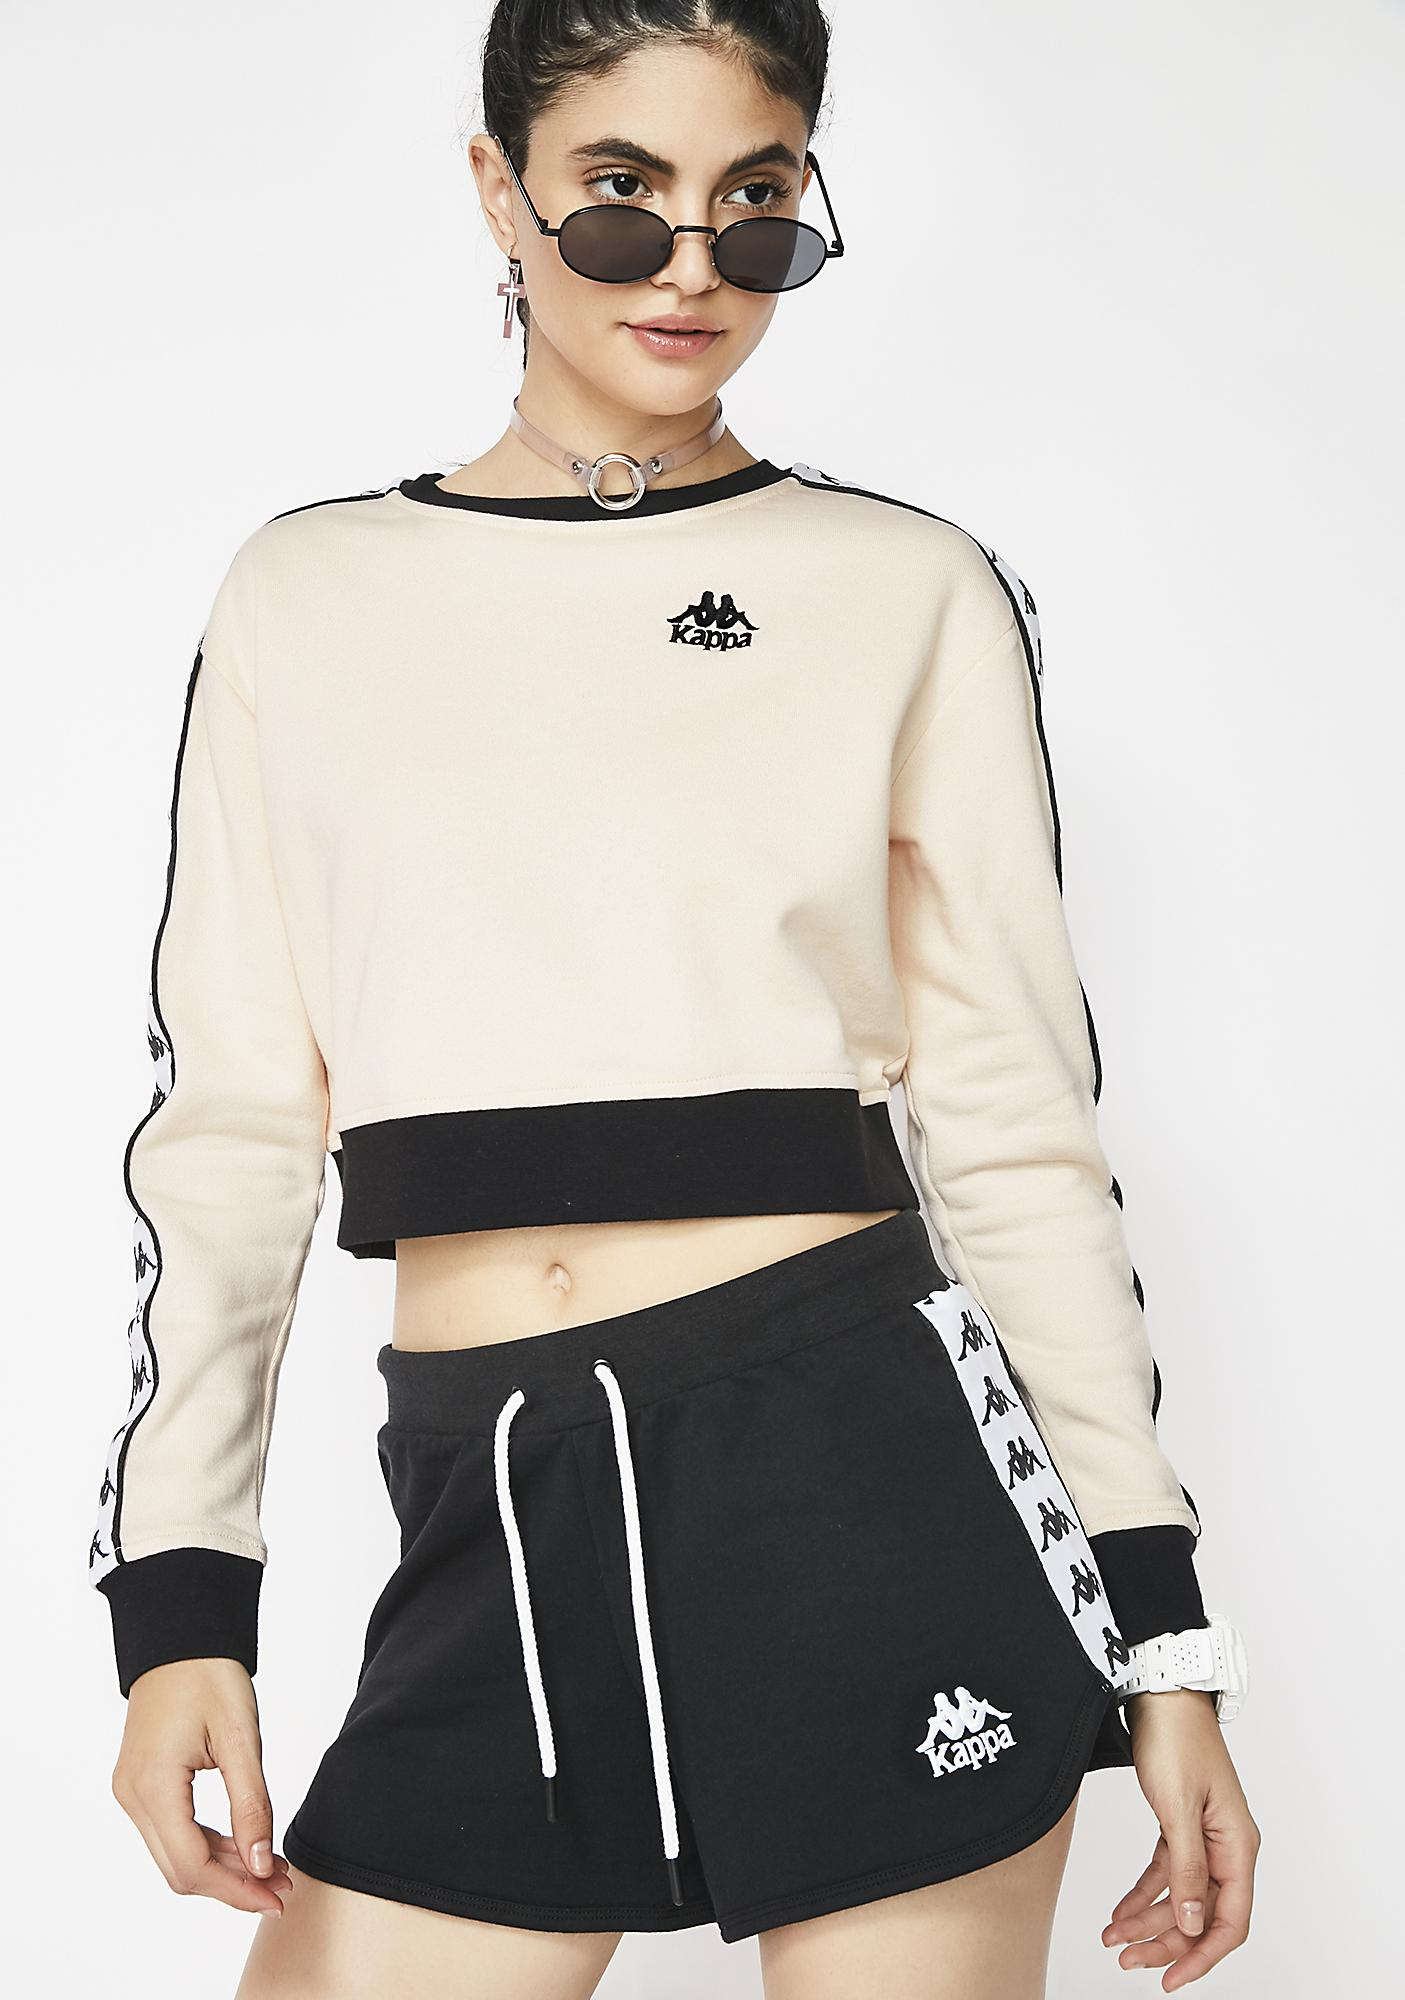 Kappa Authentic AYS Crew Sweatshirt